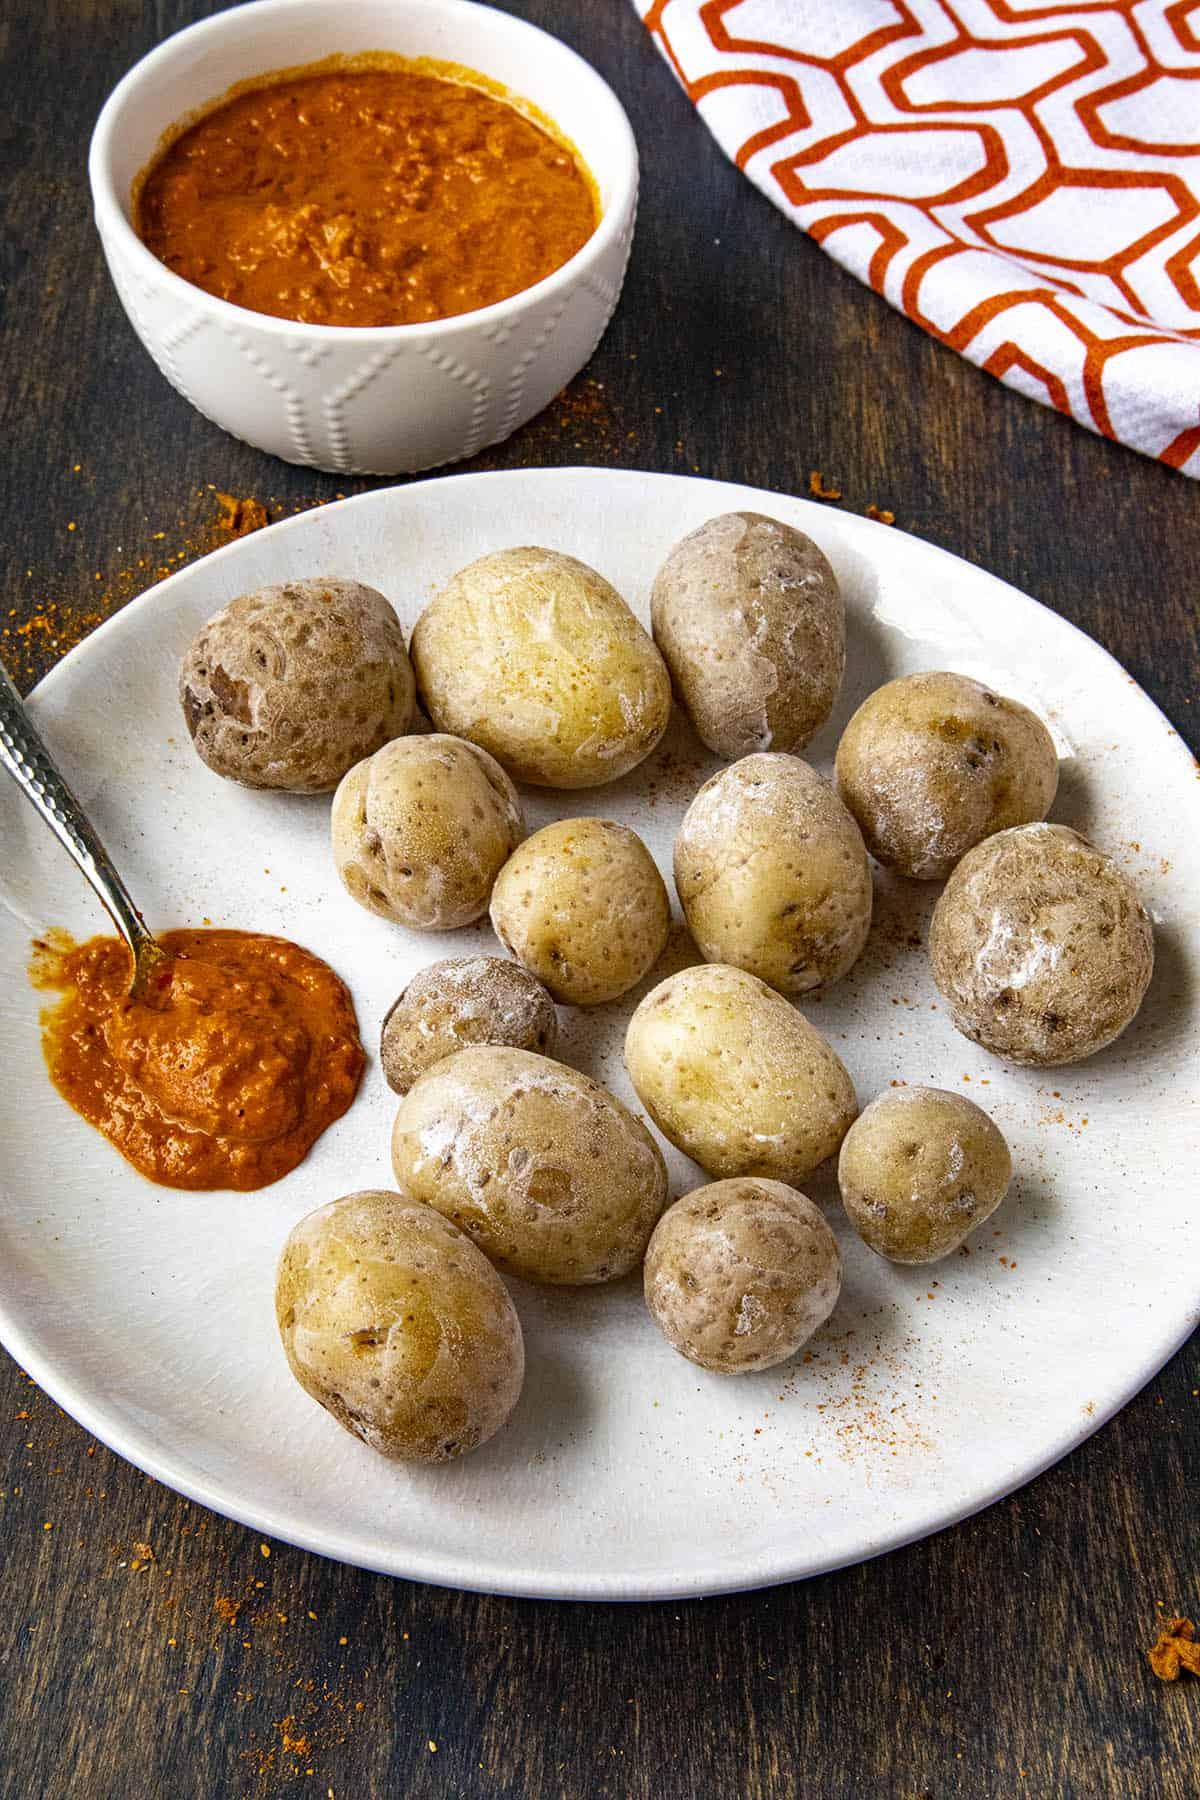 Papas Arrugadas (Wrinkly Potatoes)